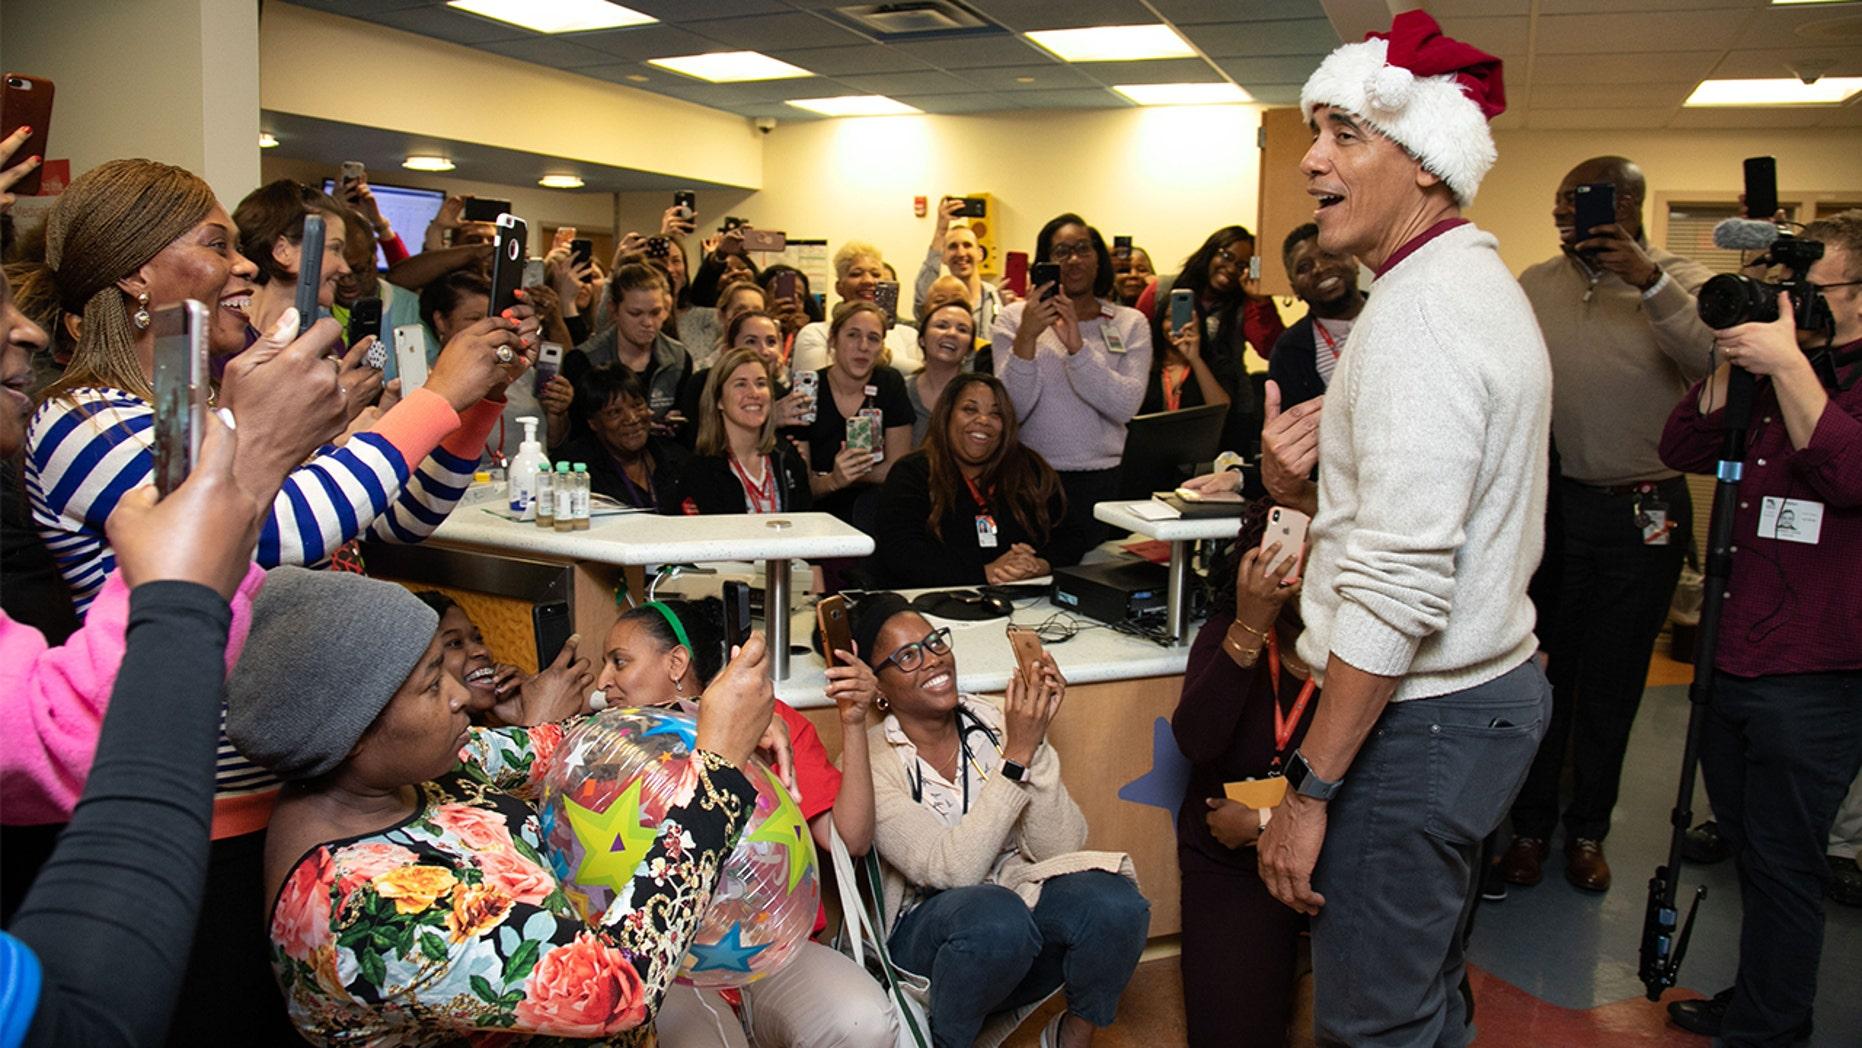 Former President Barack Obama visited Children's National hospital in Washington, D.C., on Wednesday.